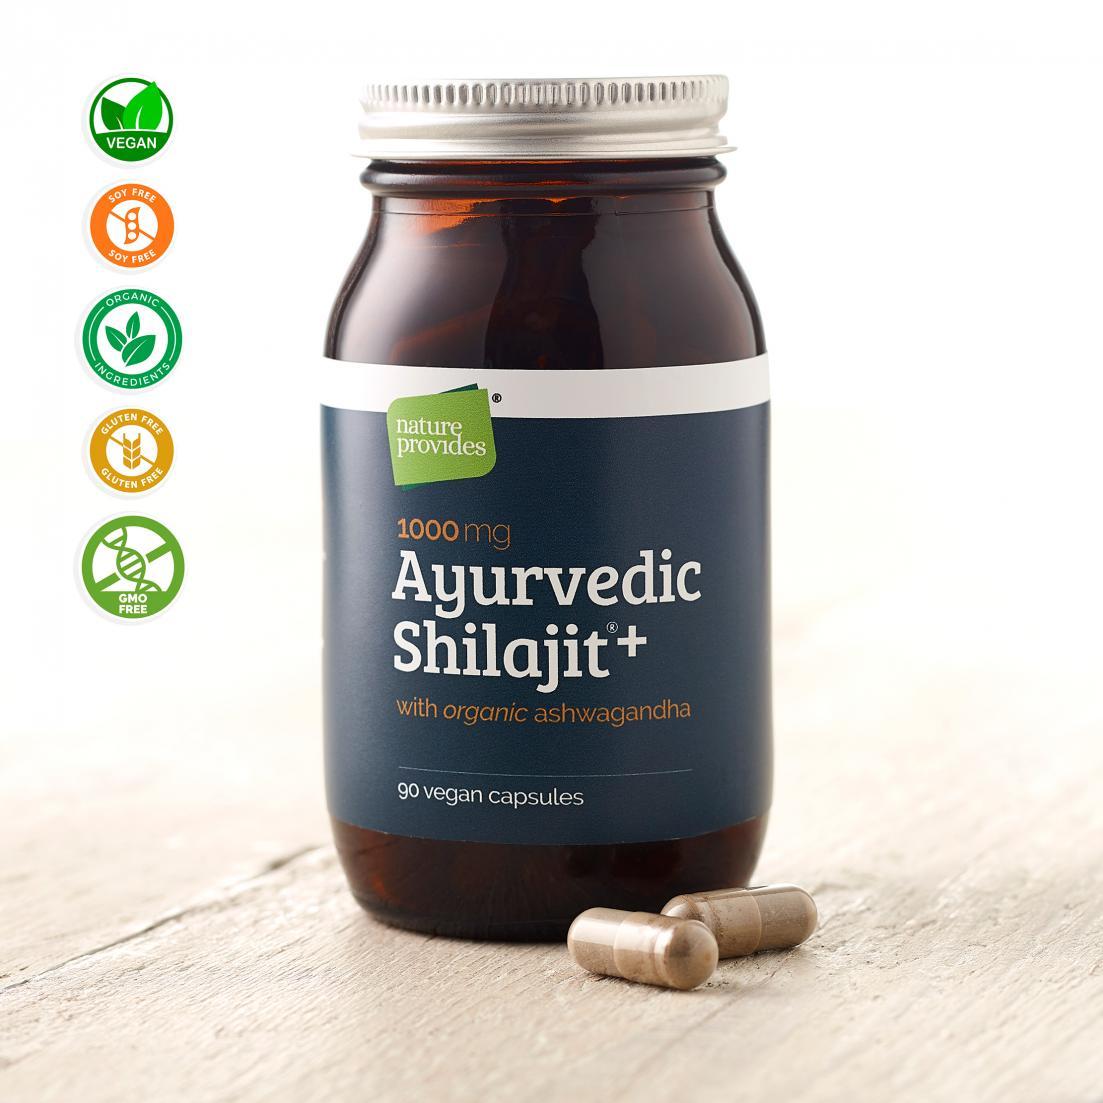 Ayurvedic Shilajit + Organic Ashwagandha 90's